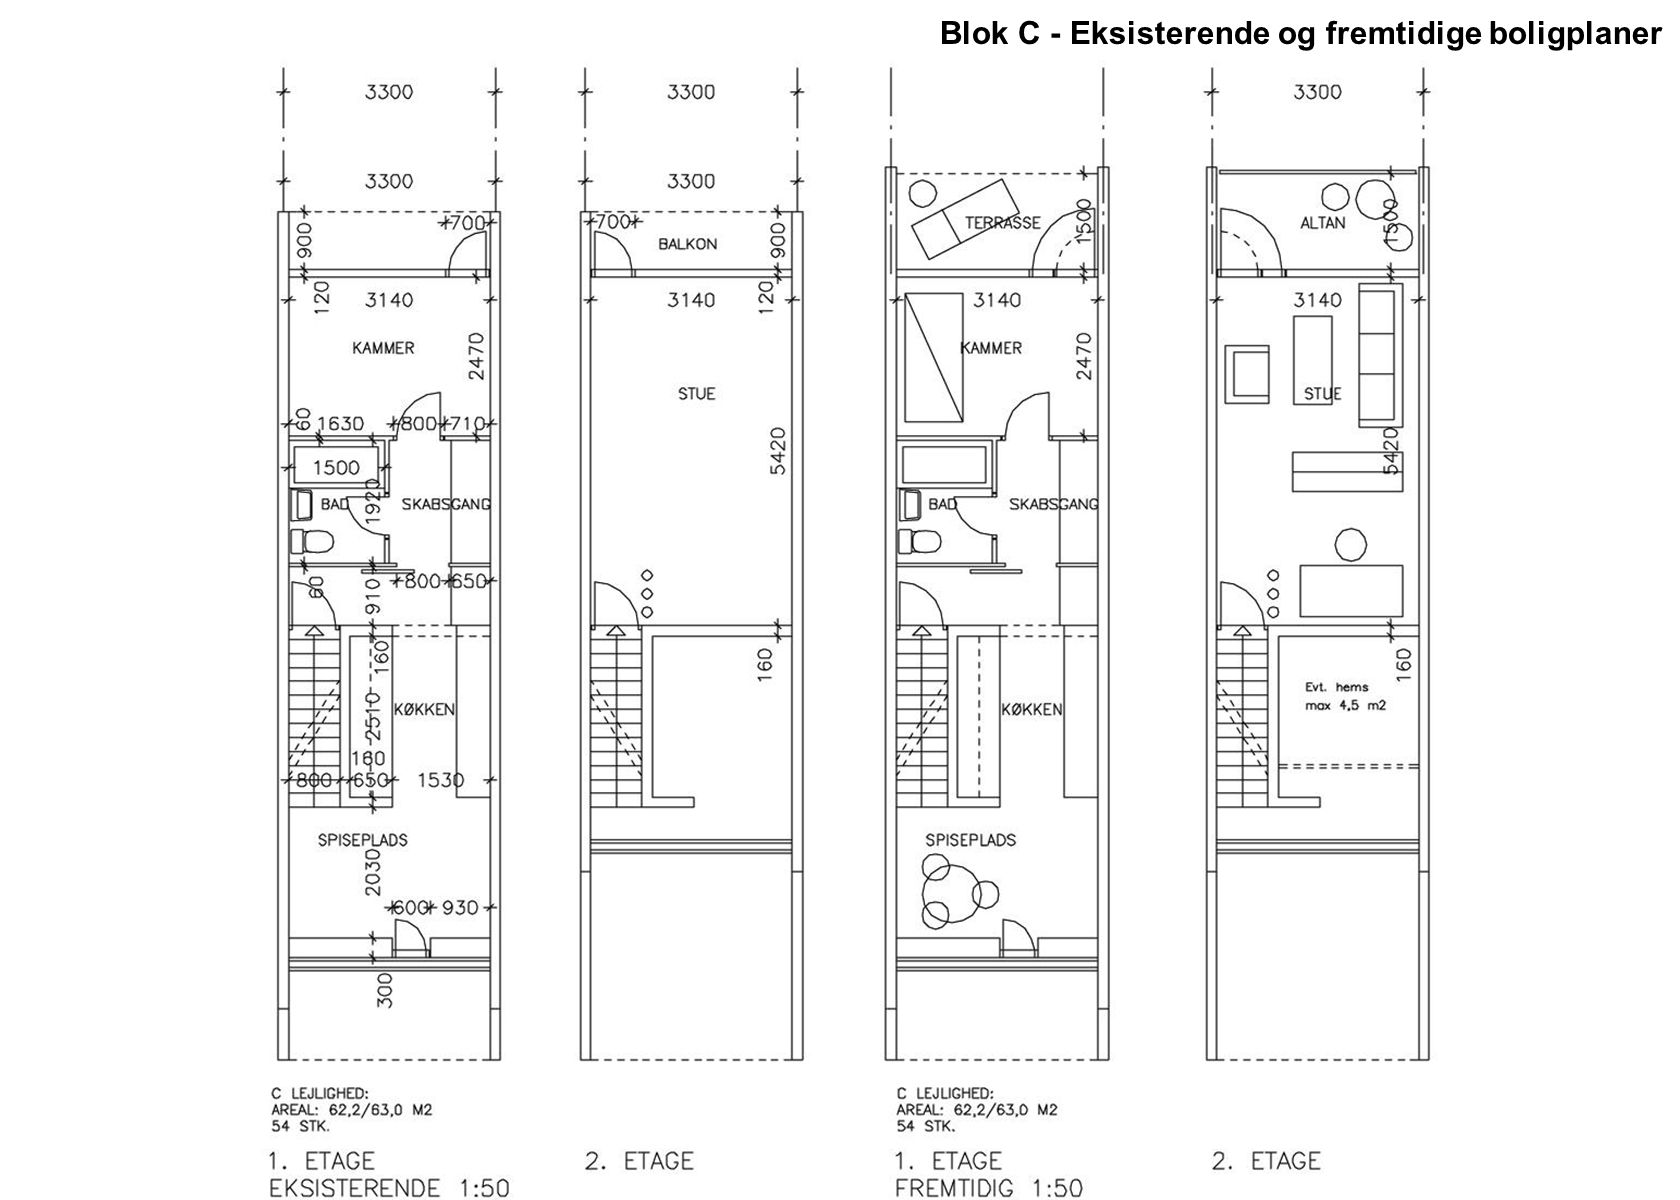 Blok C - Eksisterende og fremtidige boligplaner